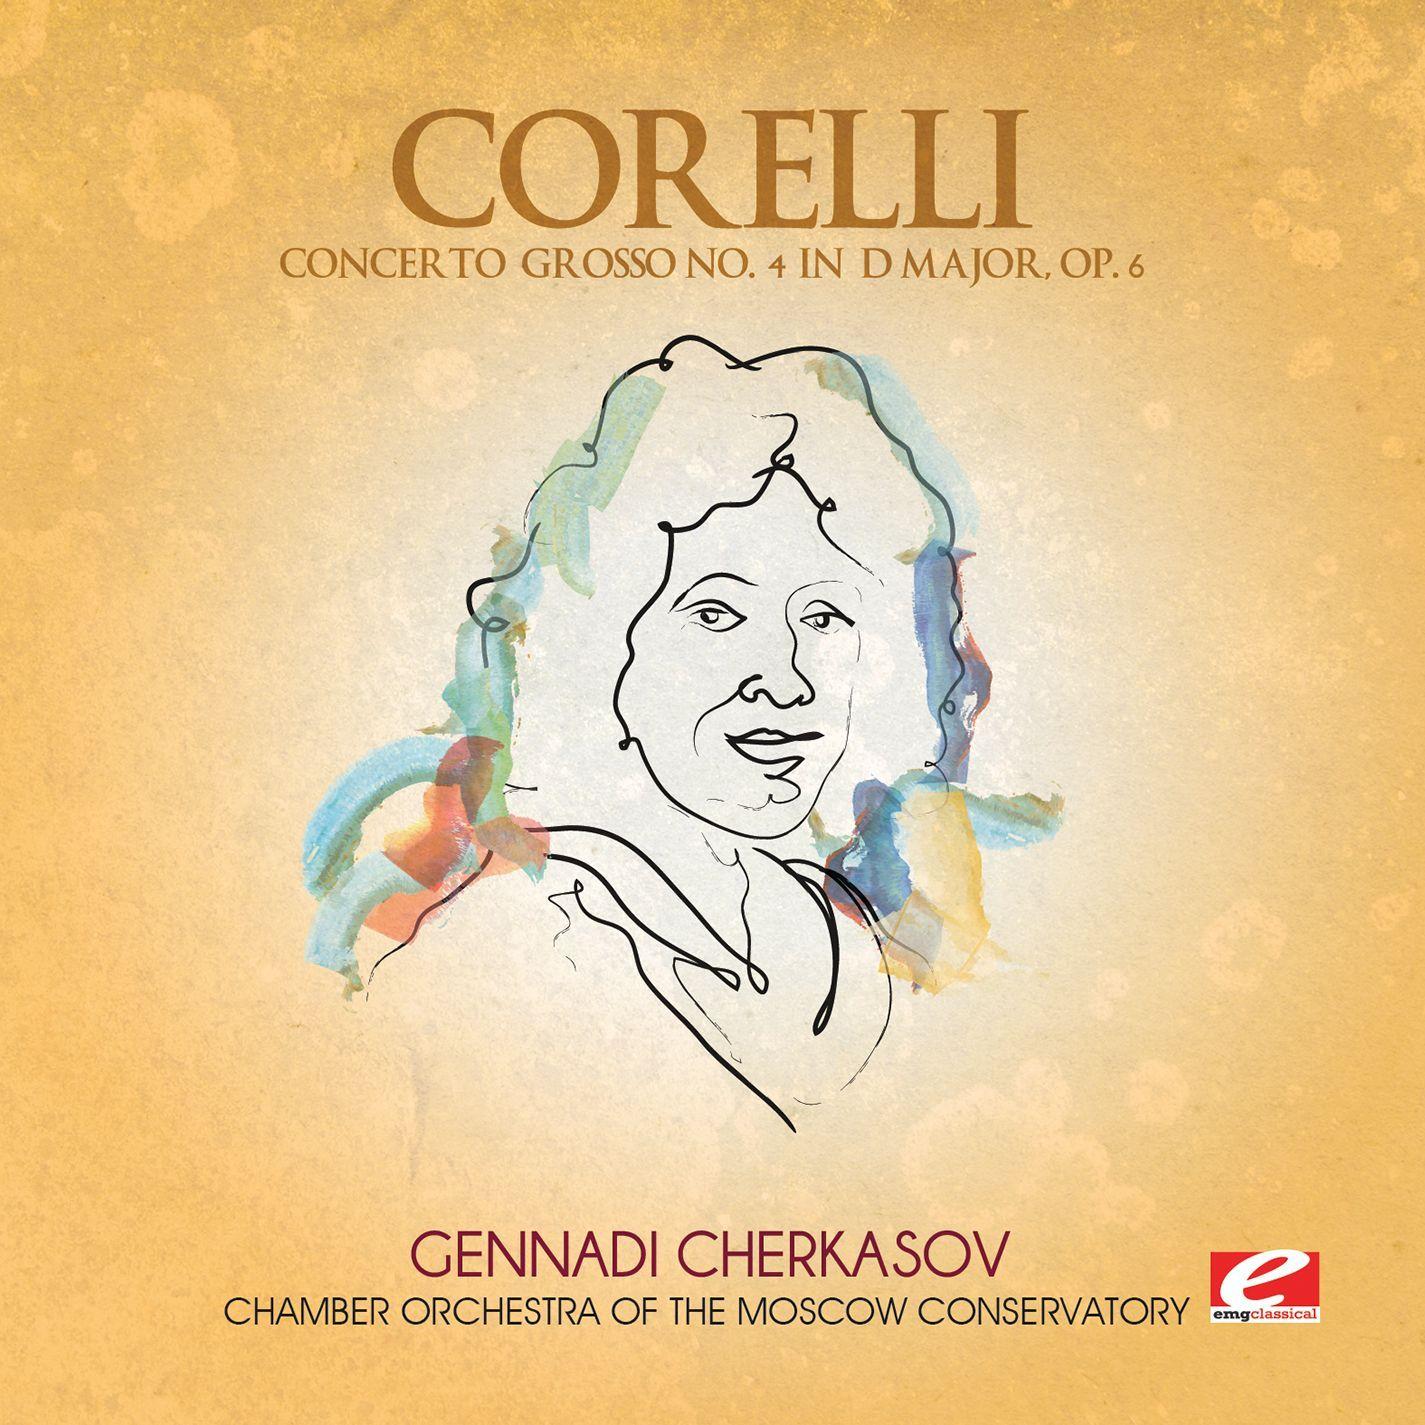 A. Corelli - Concerto Grosso 4 D Major